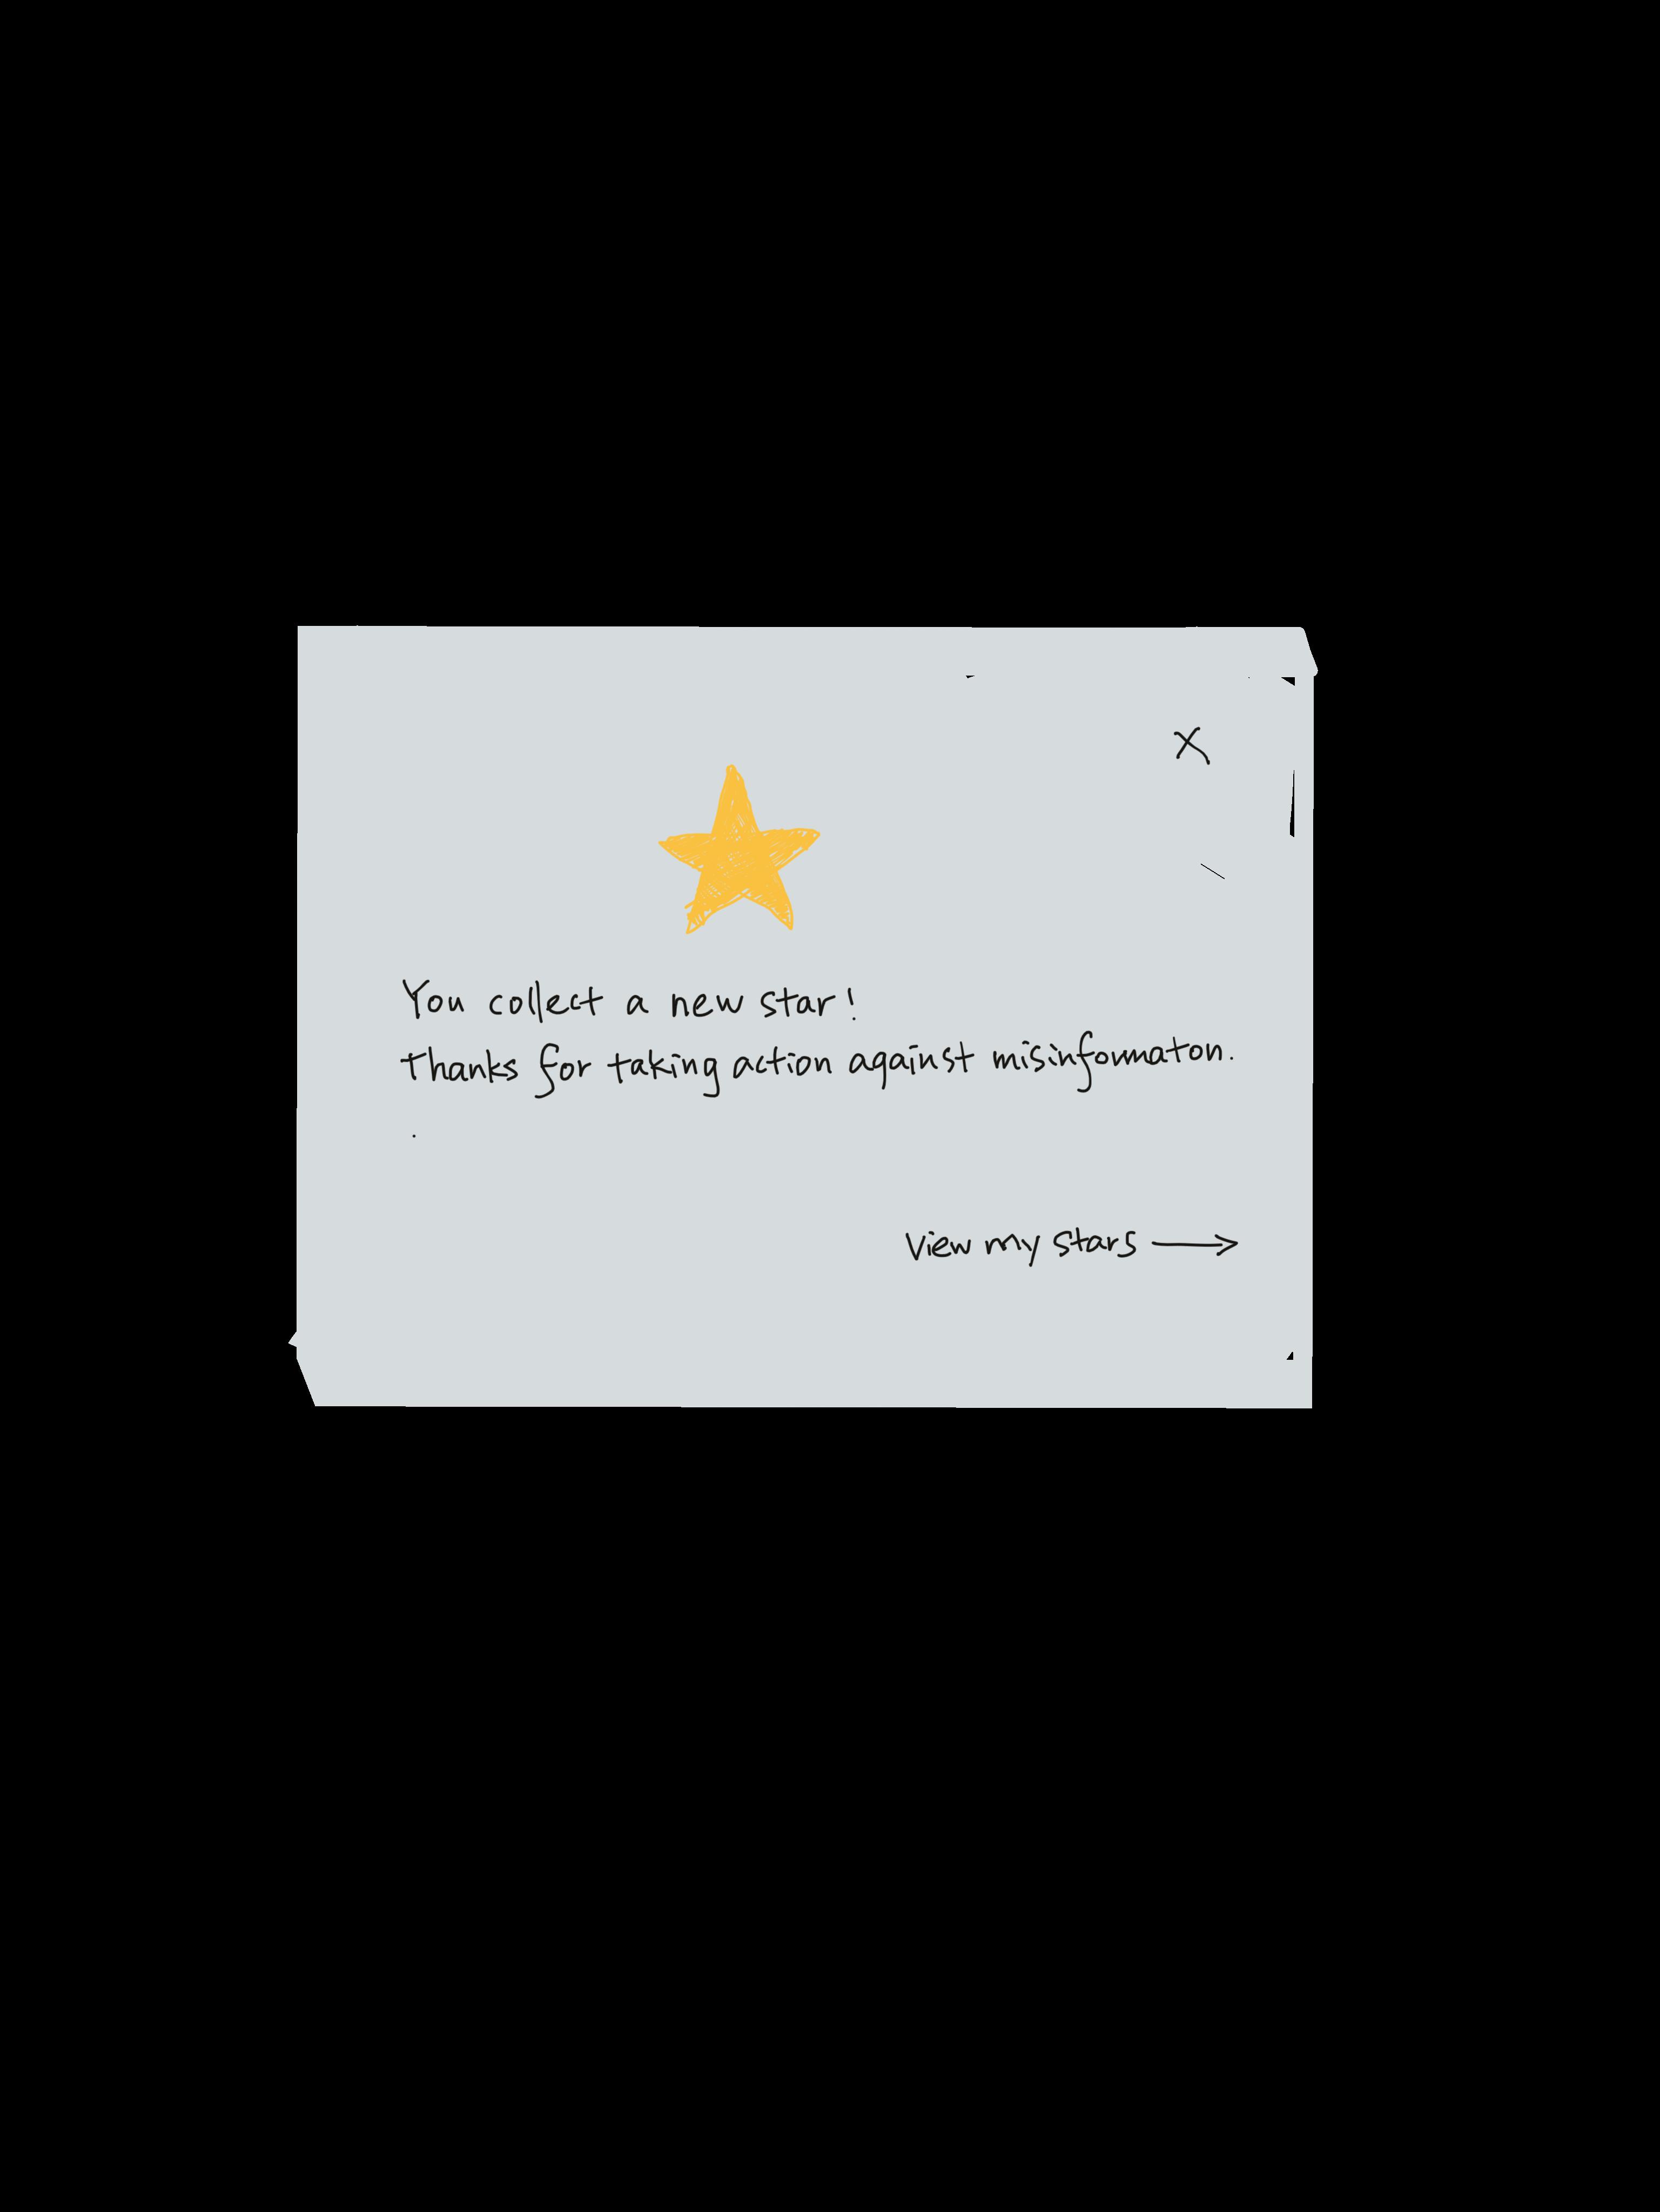 Provide positive feedbacks @Tara Lin